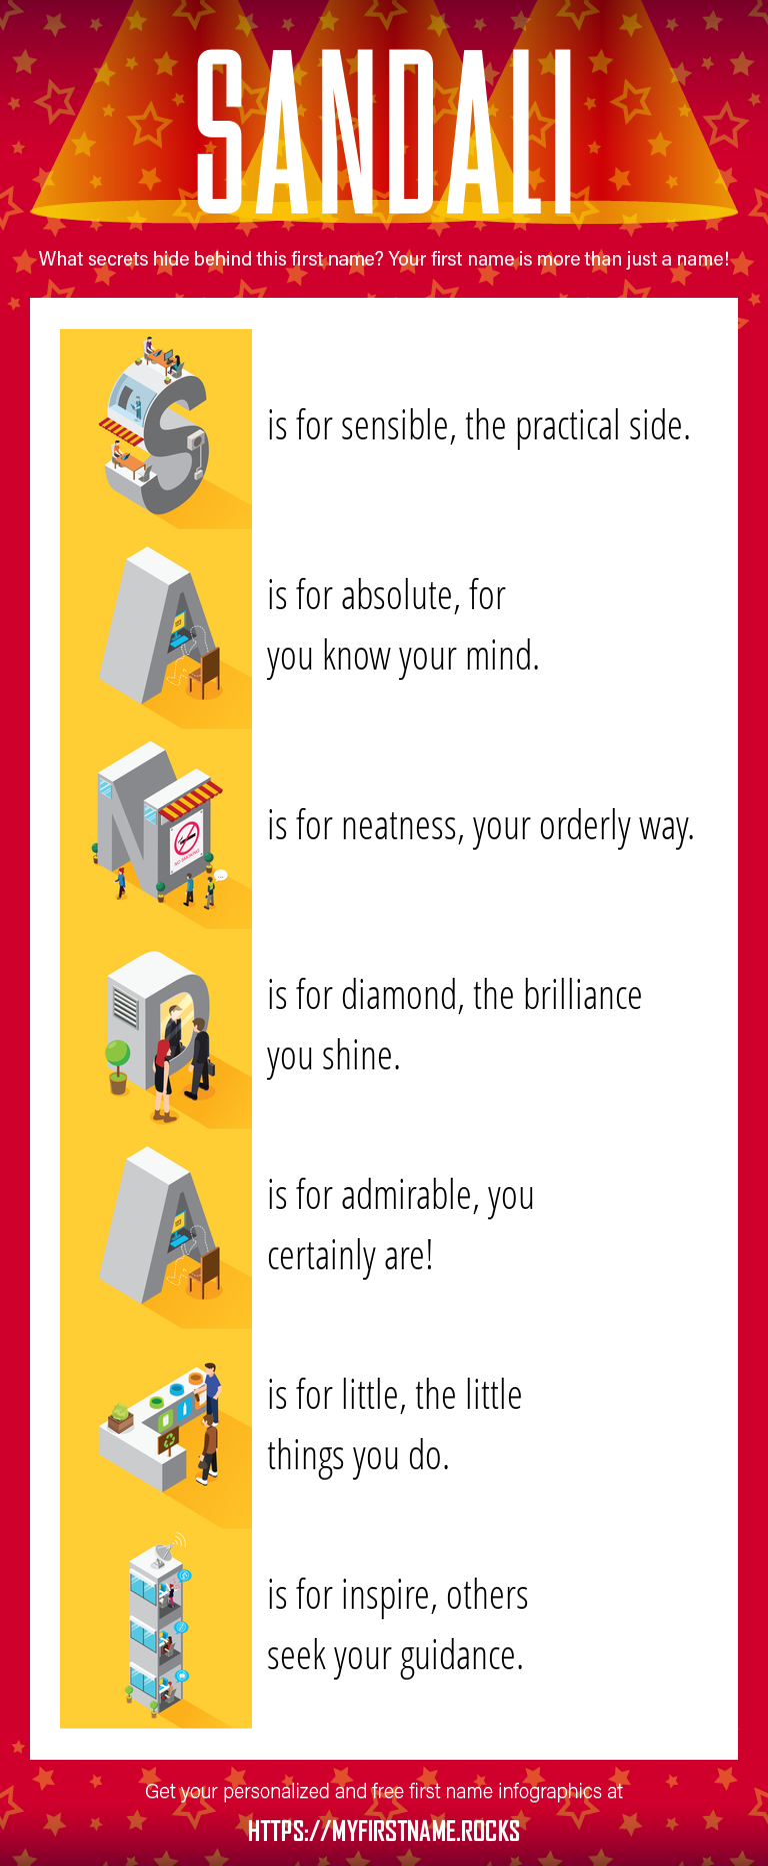 Sandali Infographics